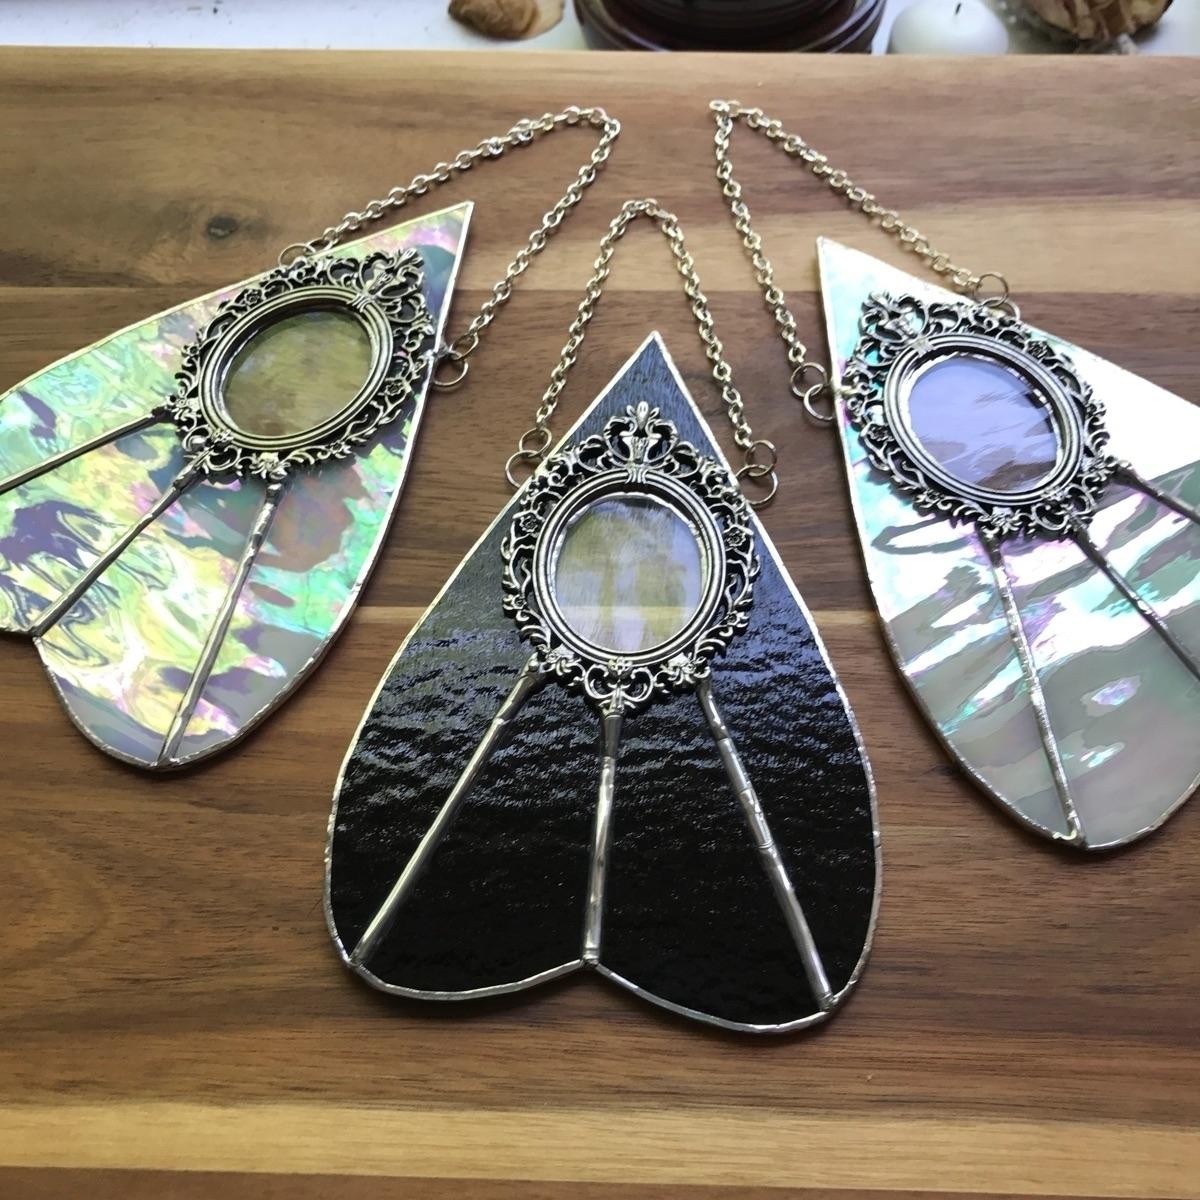 Custom order works 🖤 loving bla - wickedstainedglass | ello